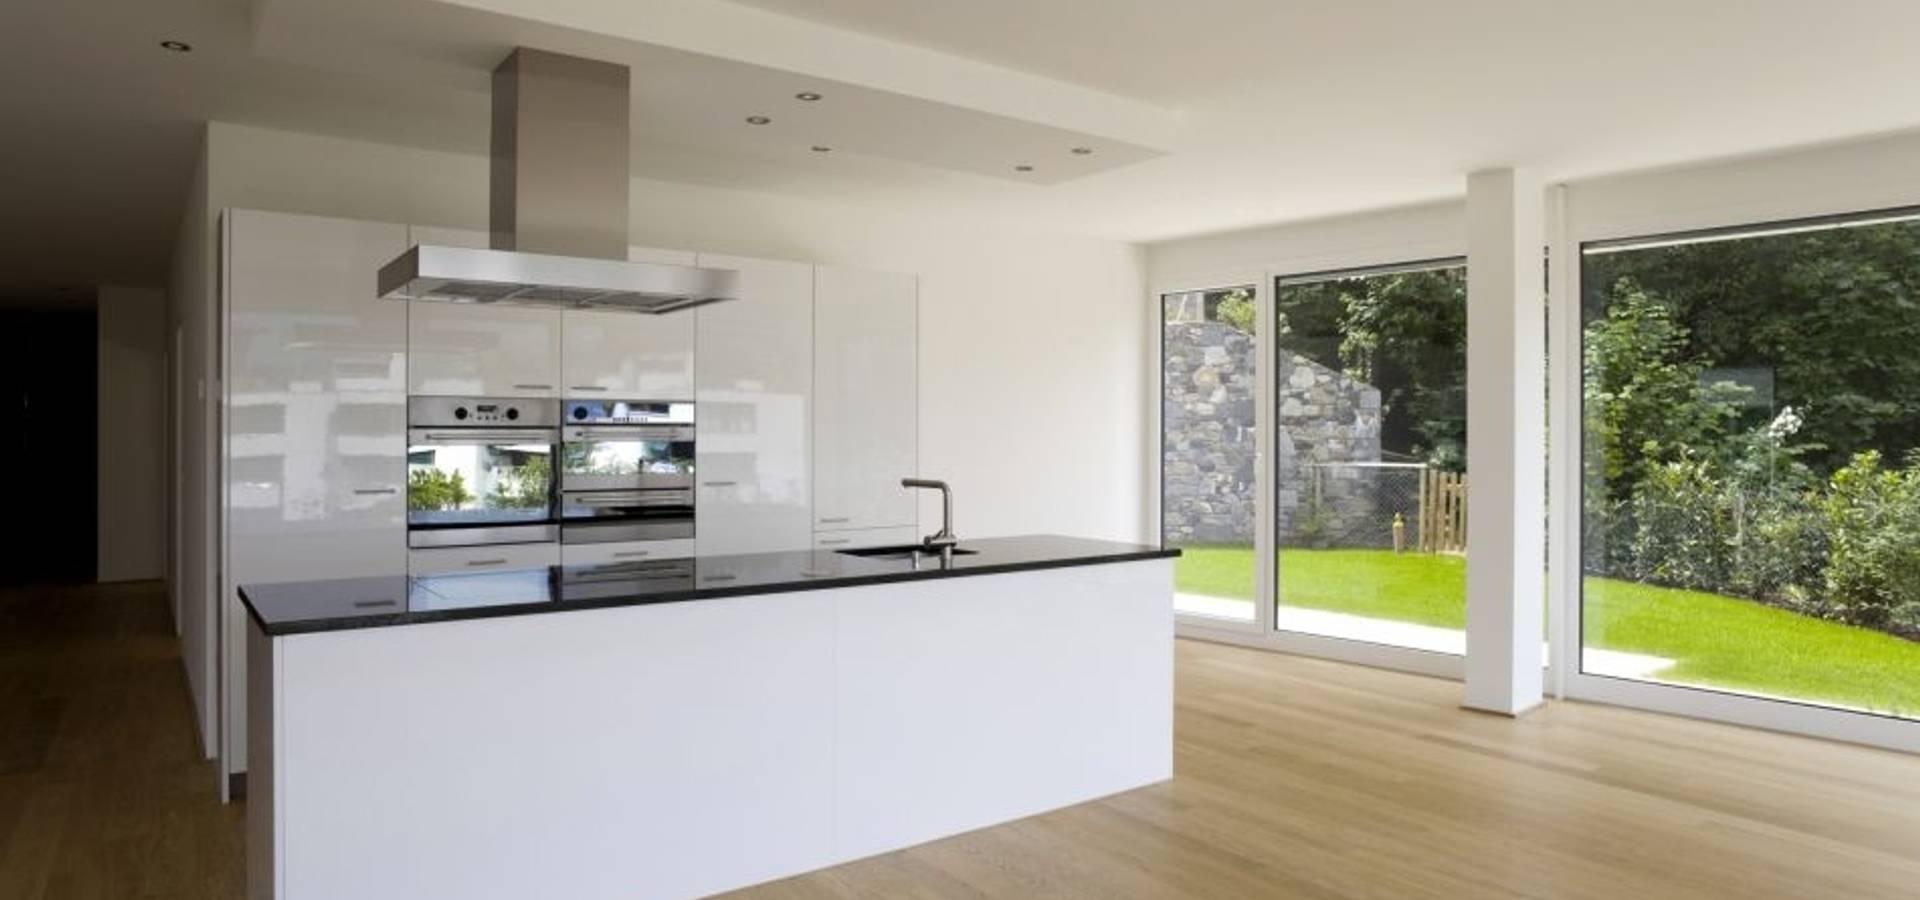 Thomas & Co Interior Design GmbH